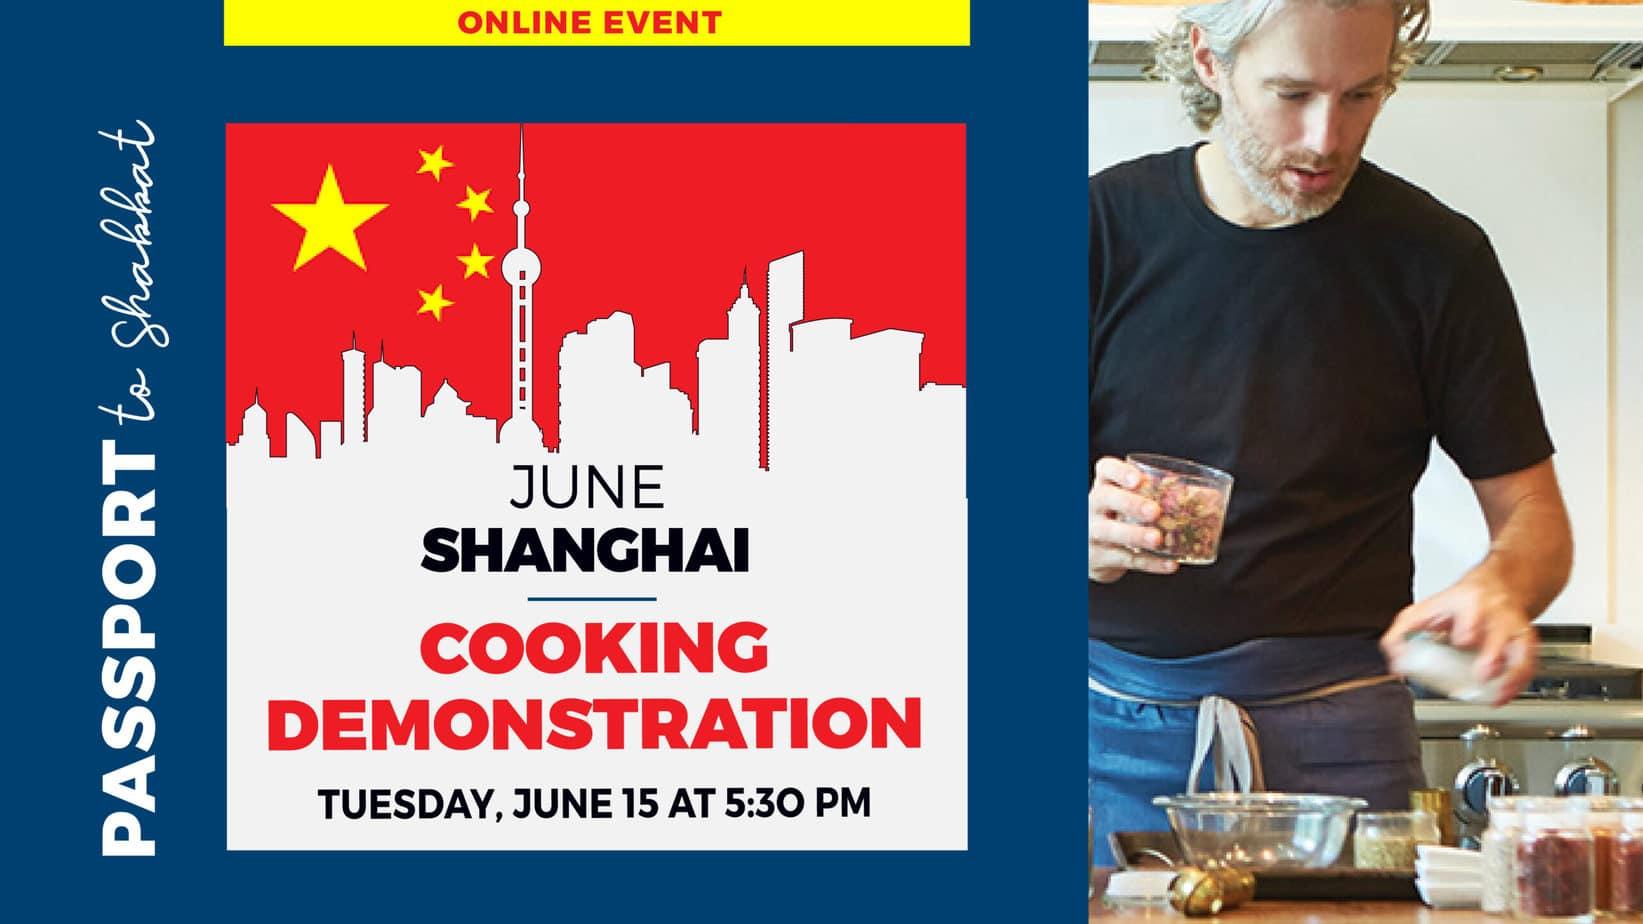 Social Media June 15 -online event